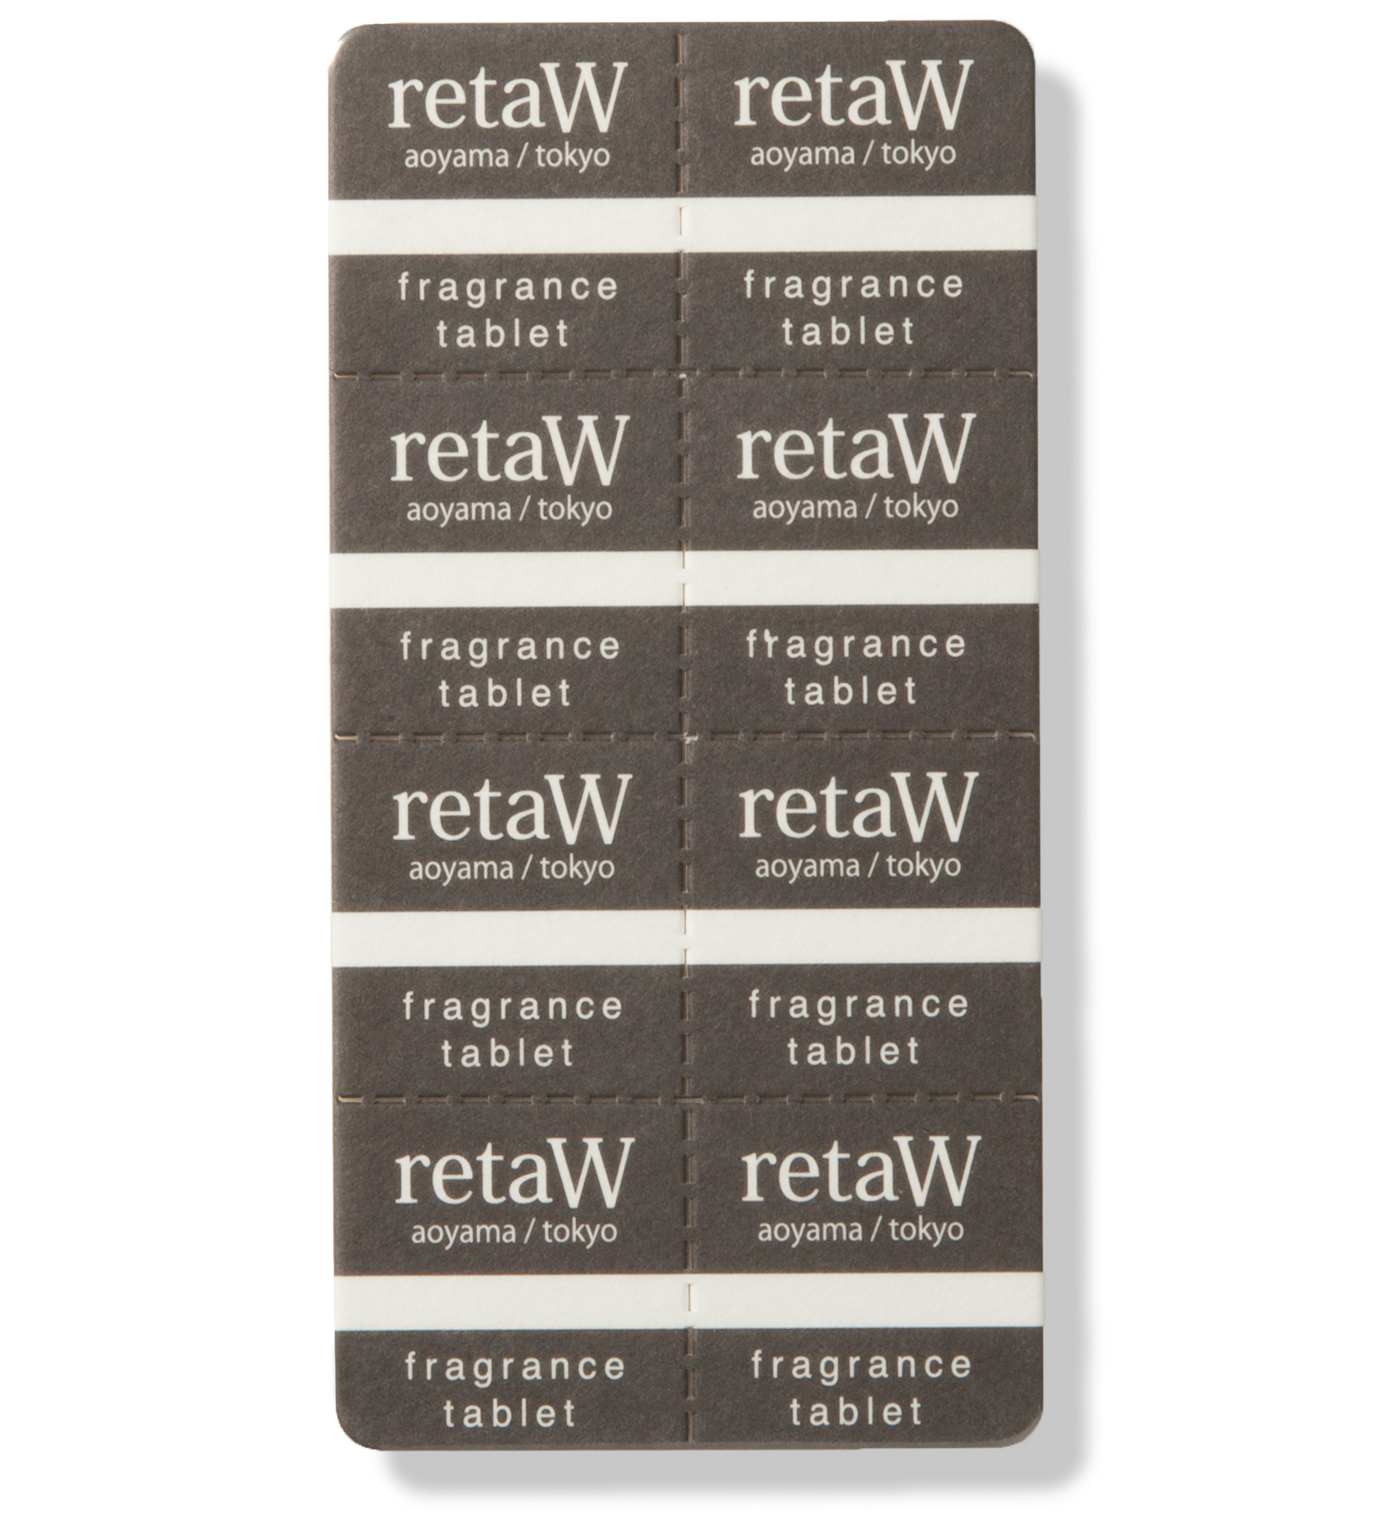 retaW Allen Fragrance Tablet